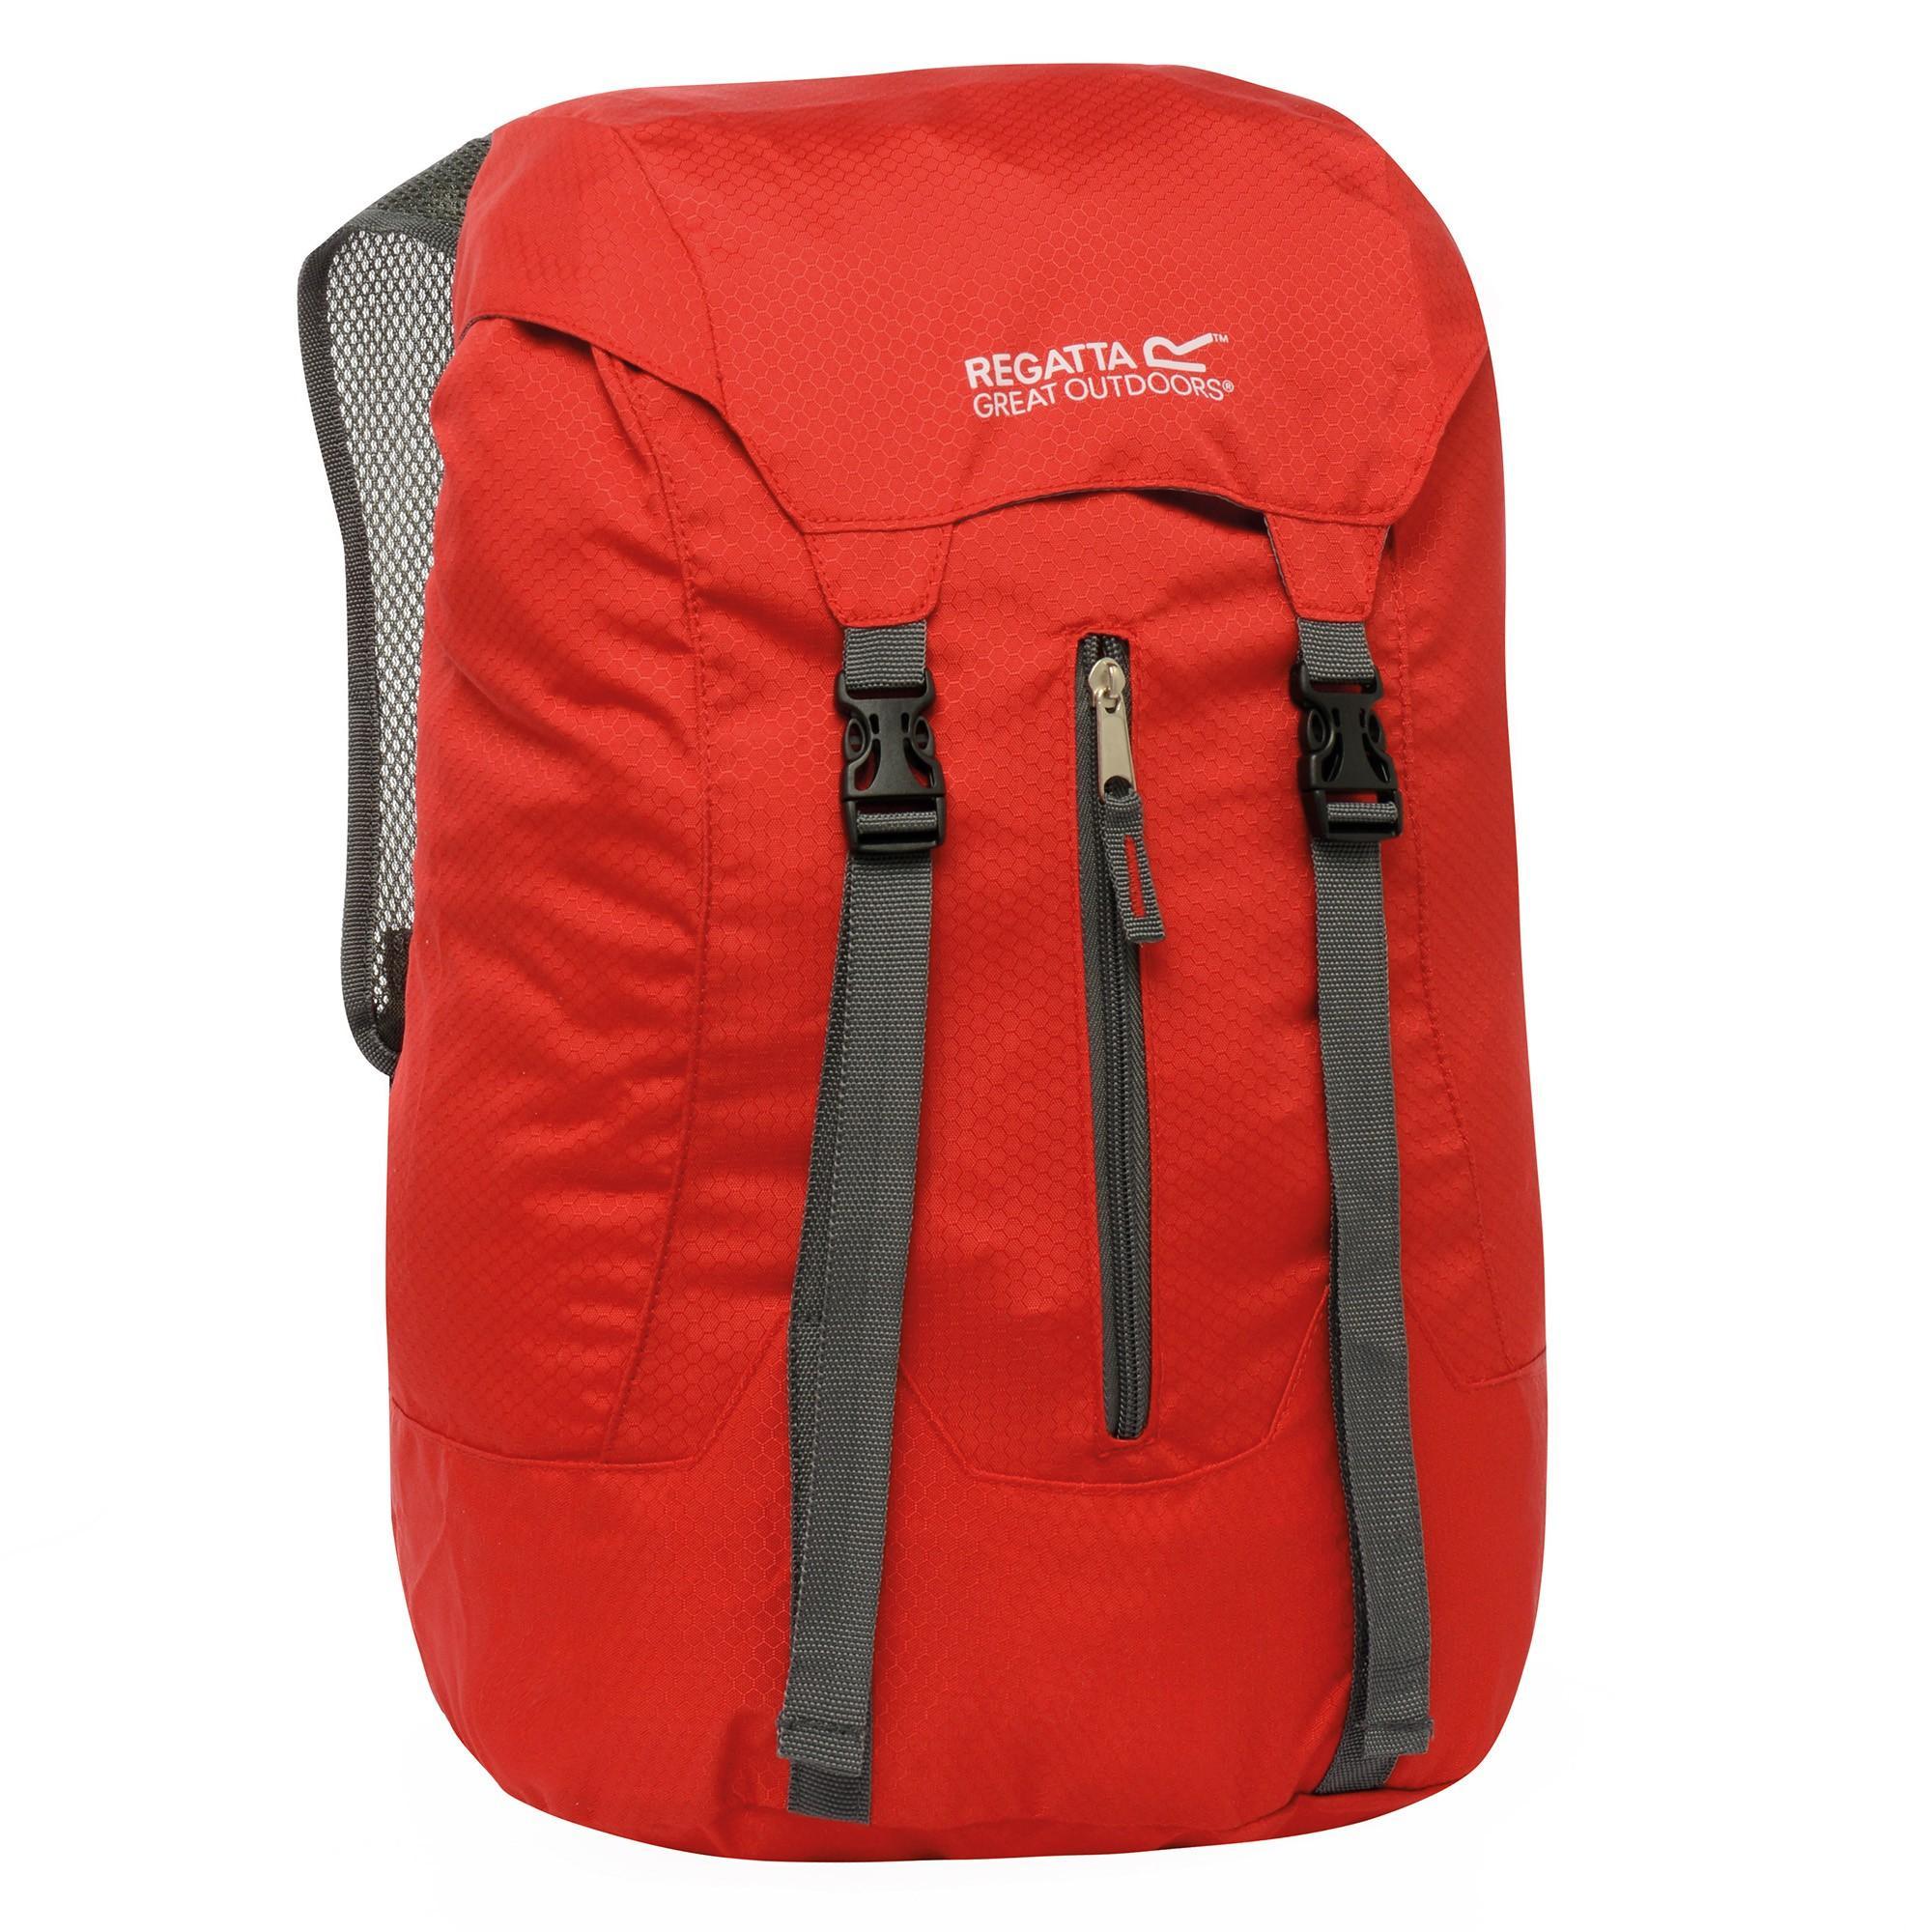 Regatta 25L Backpack Red lowest price